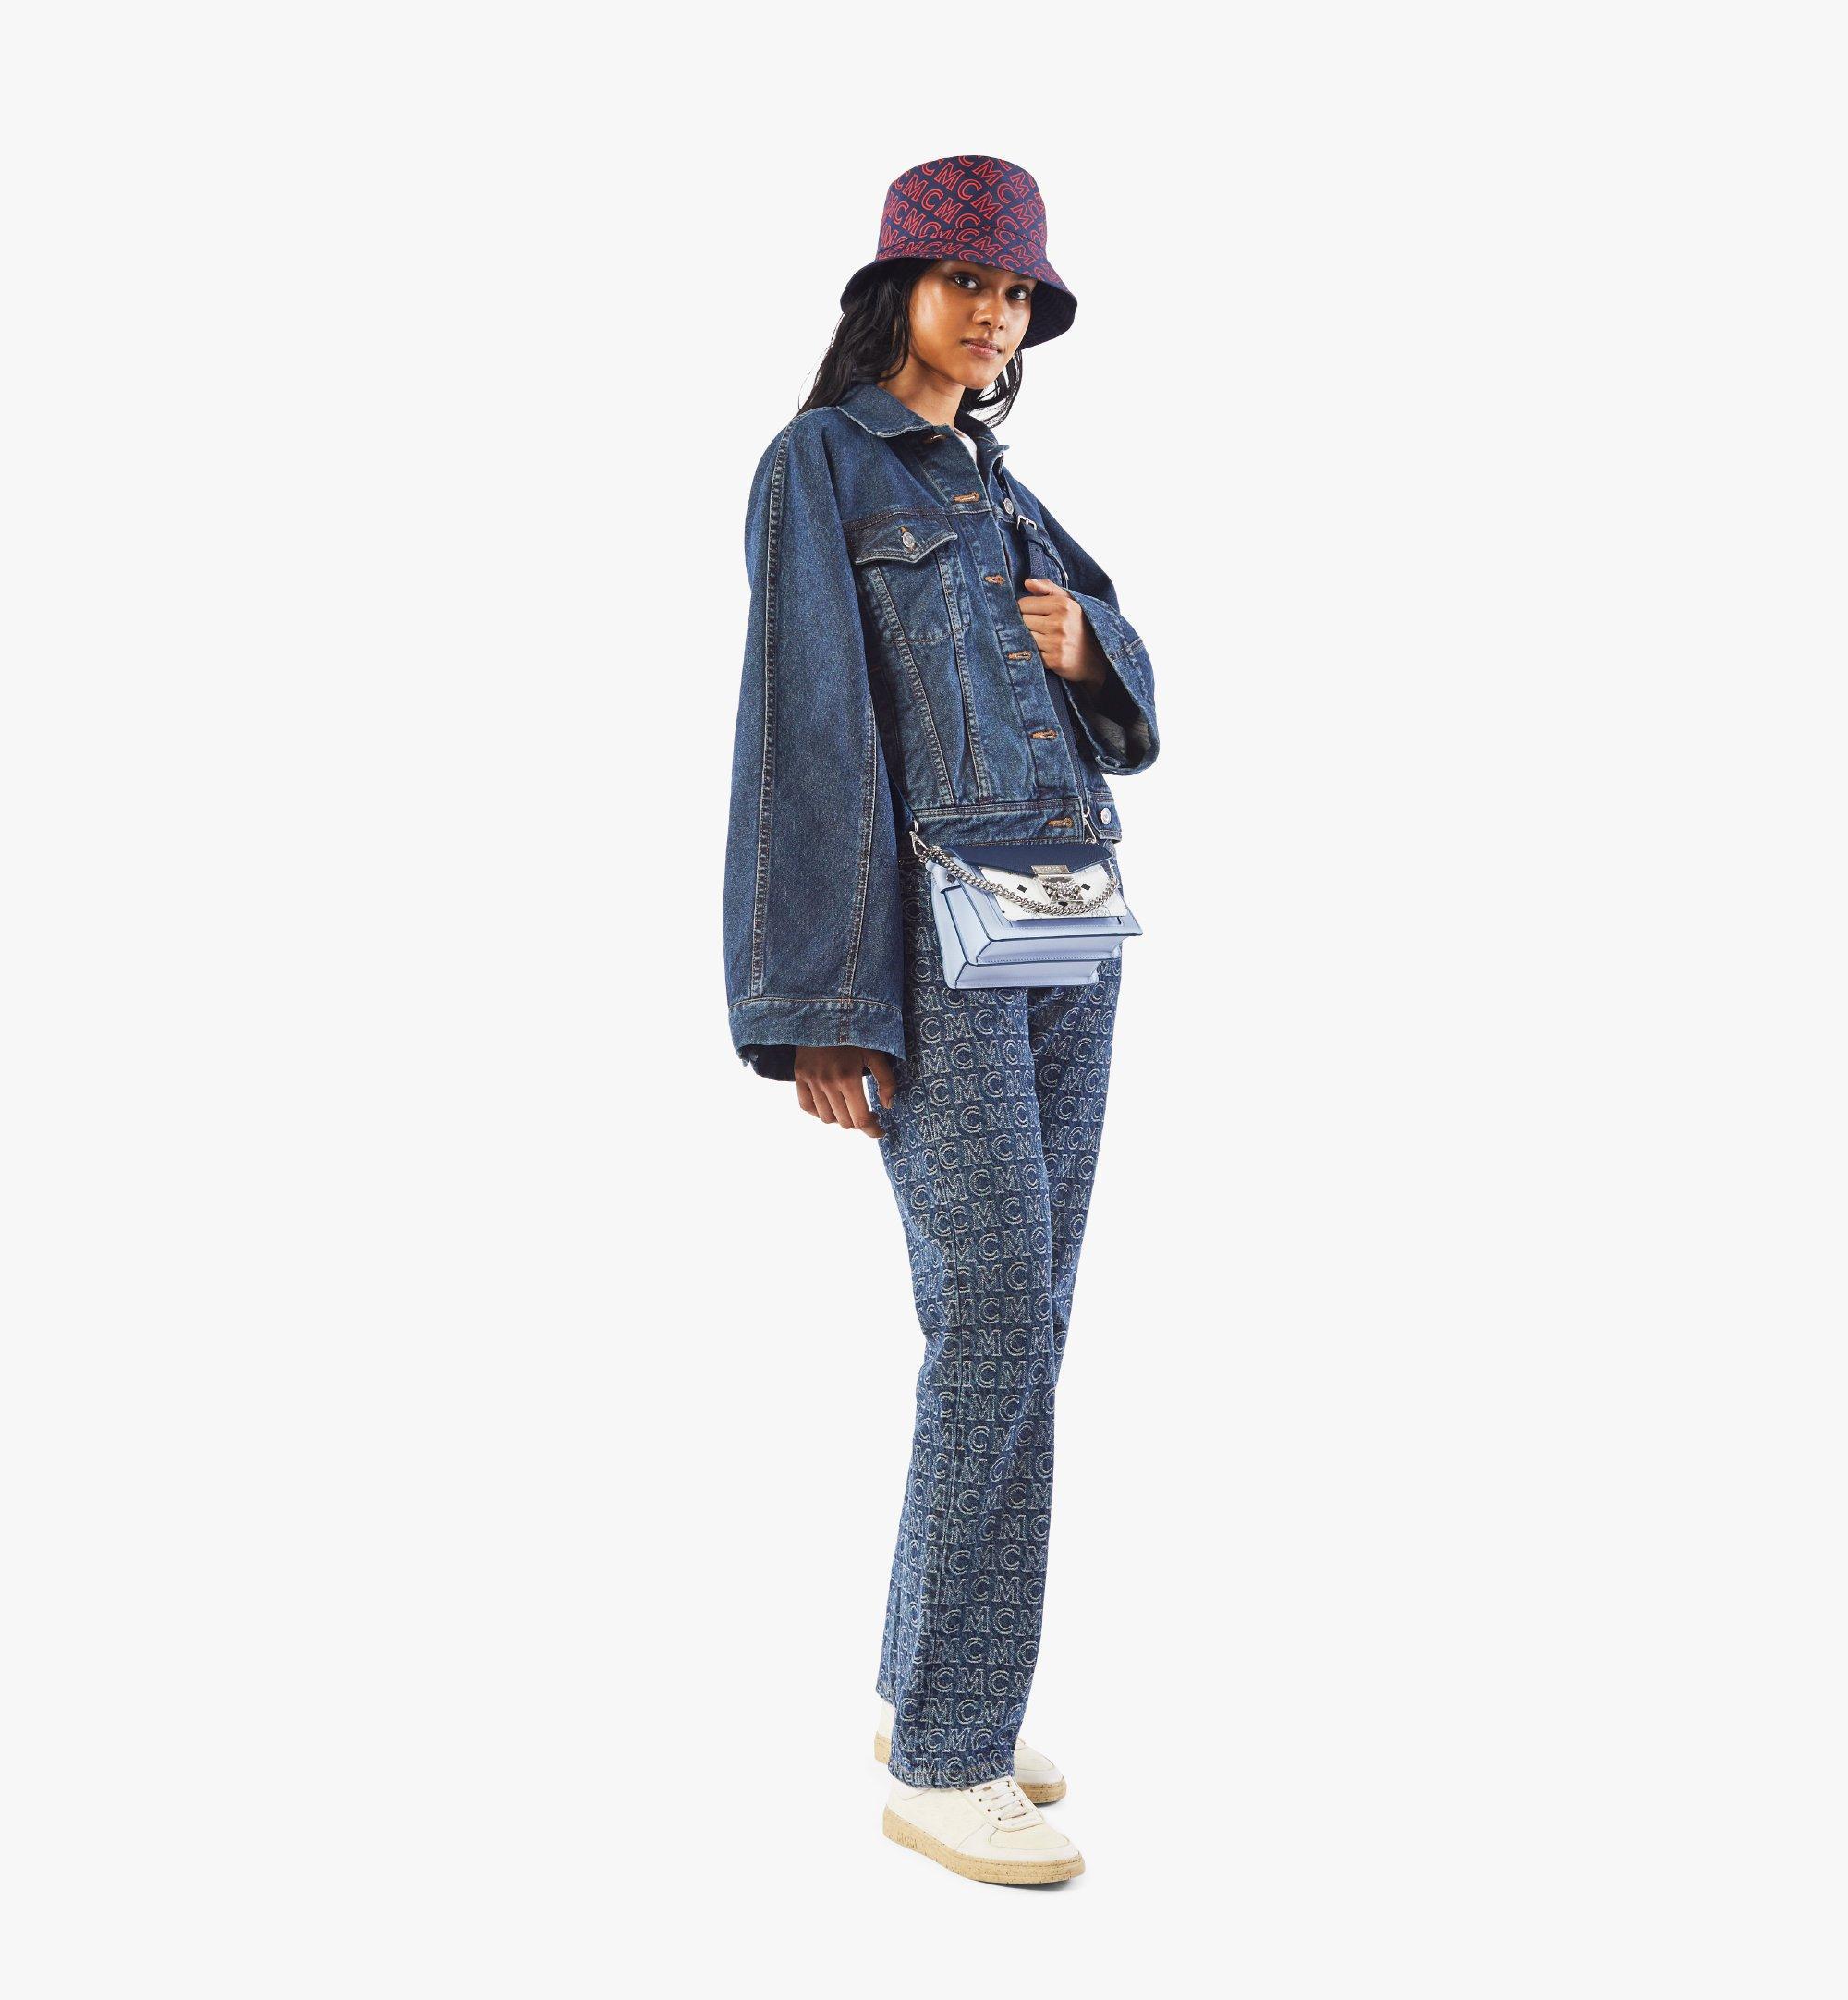 MCM Patricia Crossbody in Color Block Visetos Black MWRAAPA06VW001 Alternate View 3